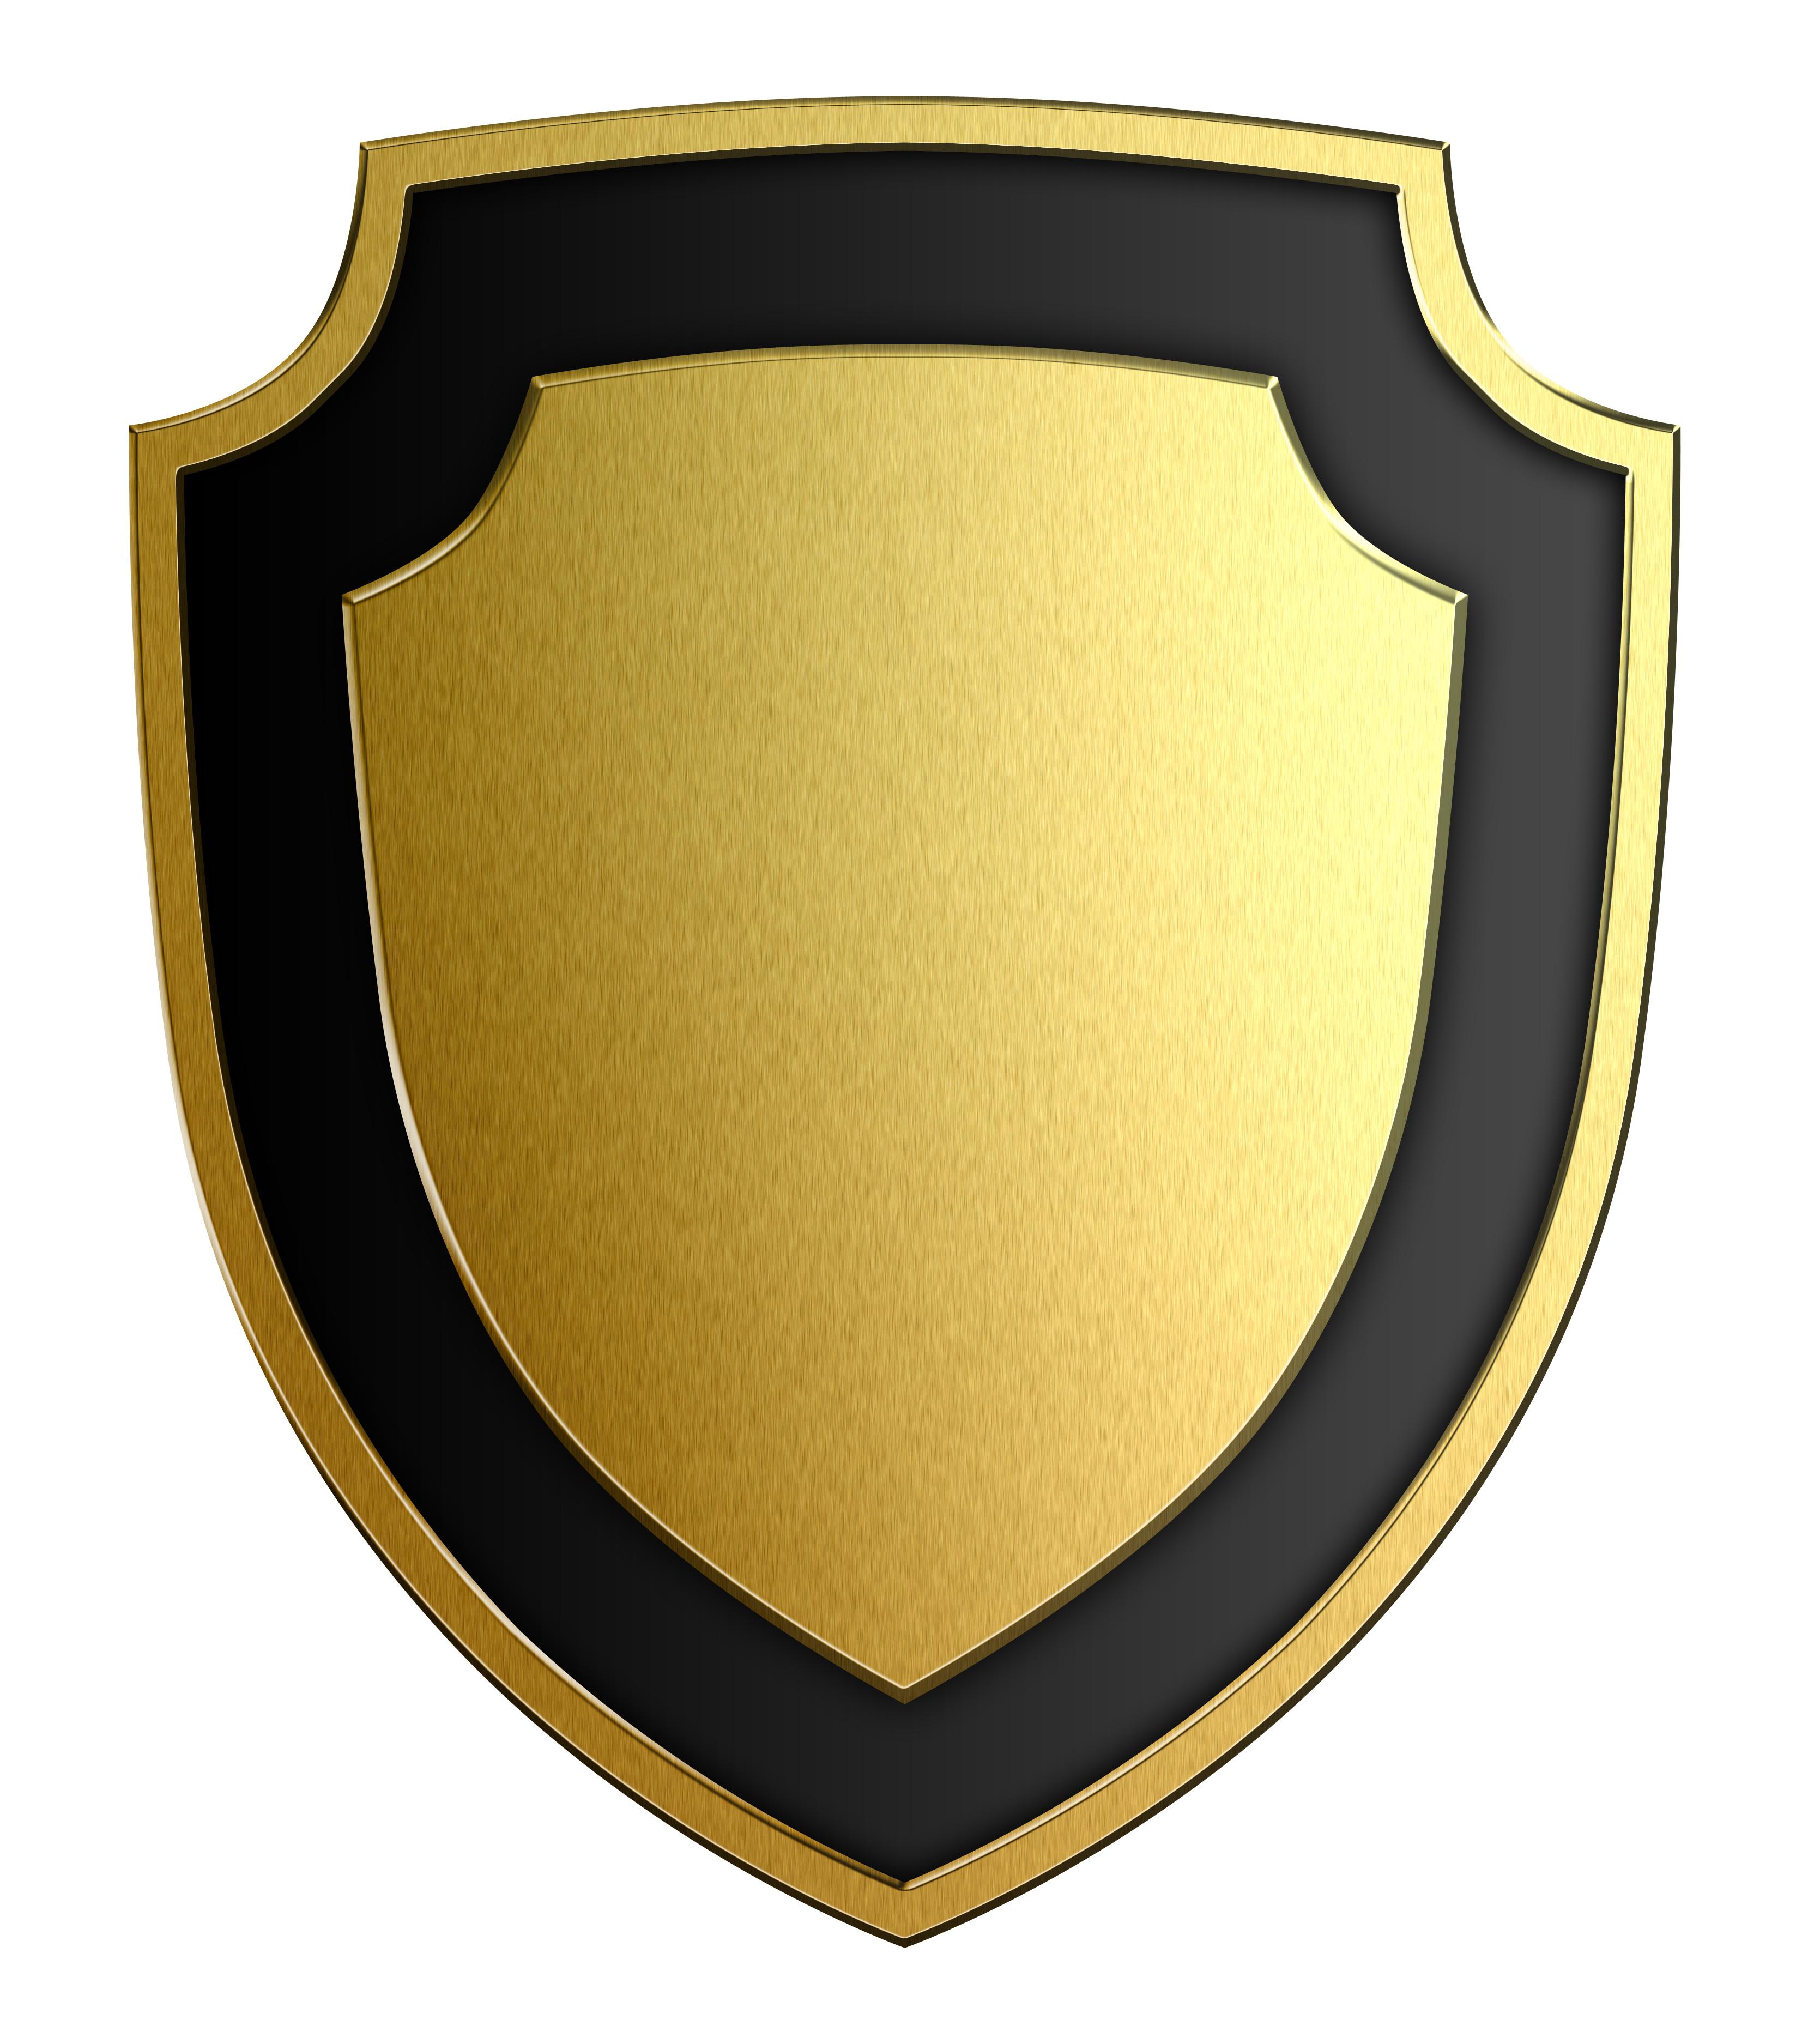 Gold Shield PNG Image - PurePNG | Free transparent CC0 PNG ...